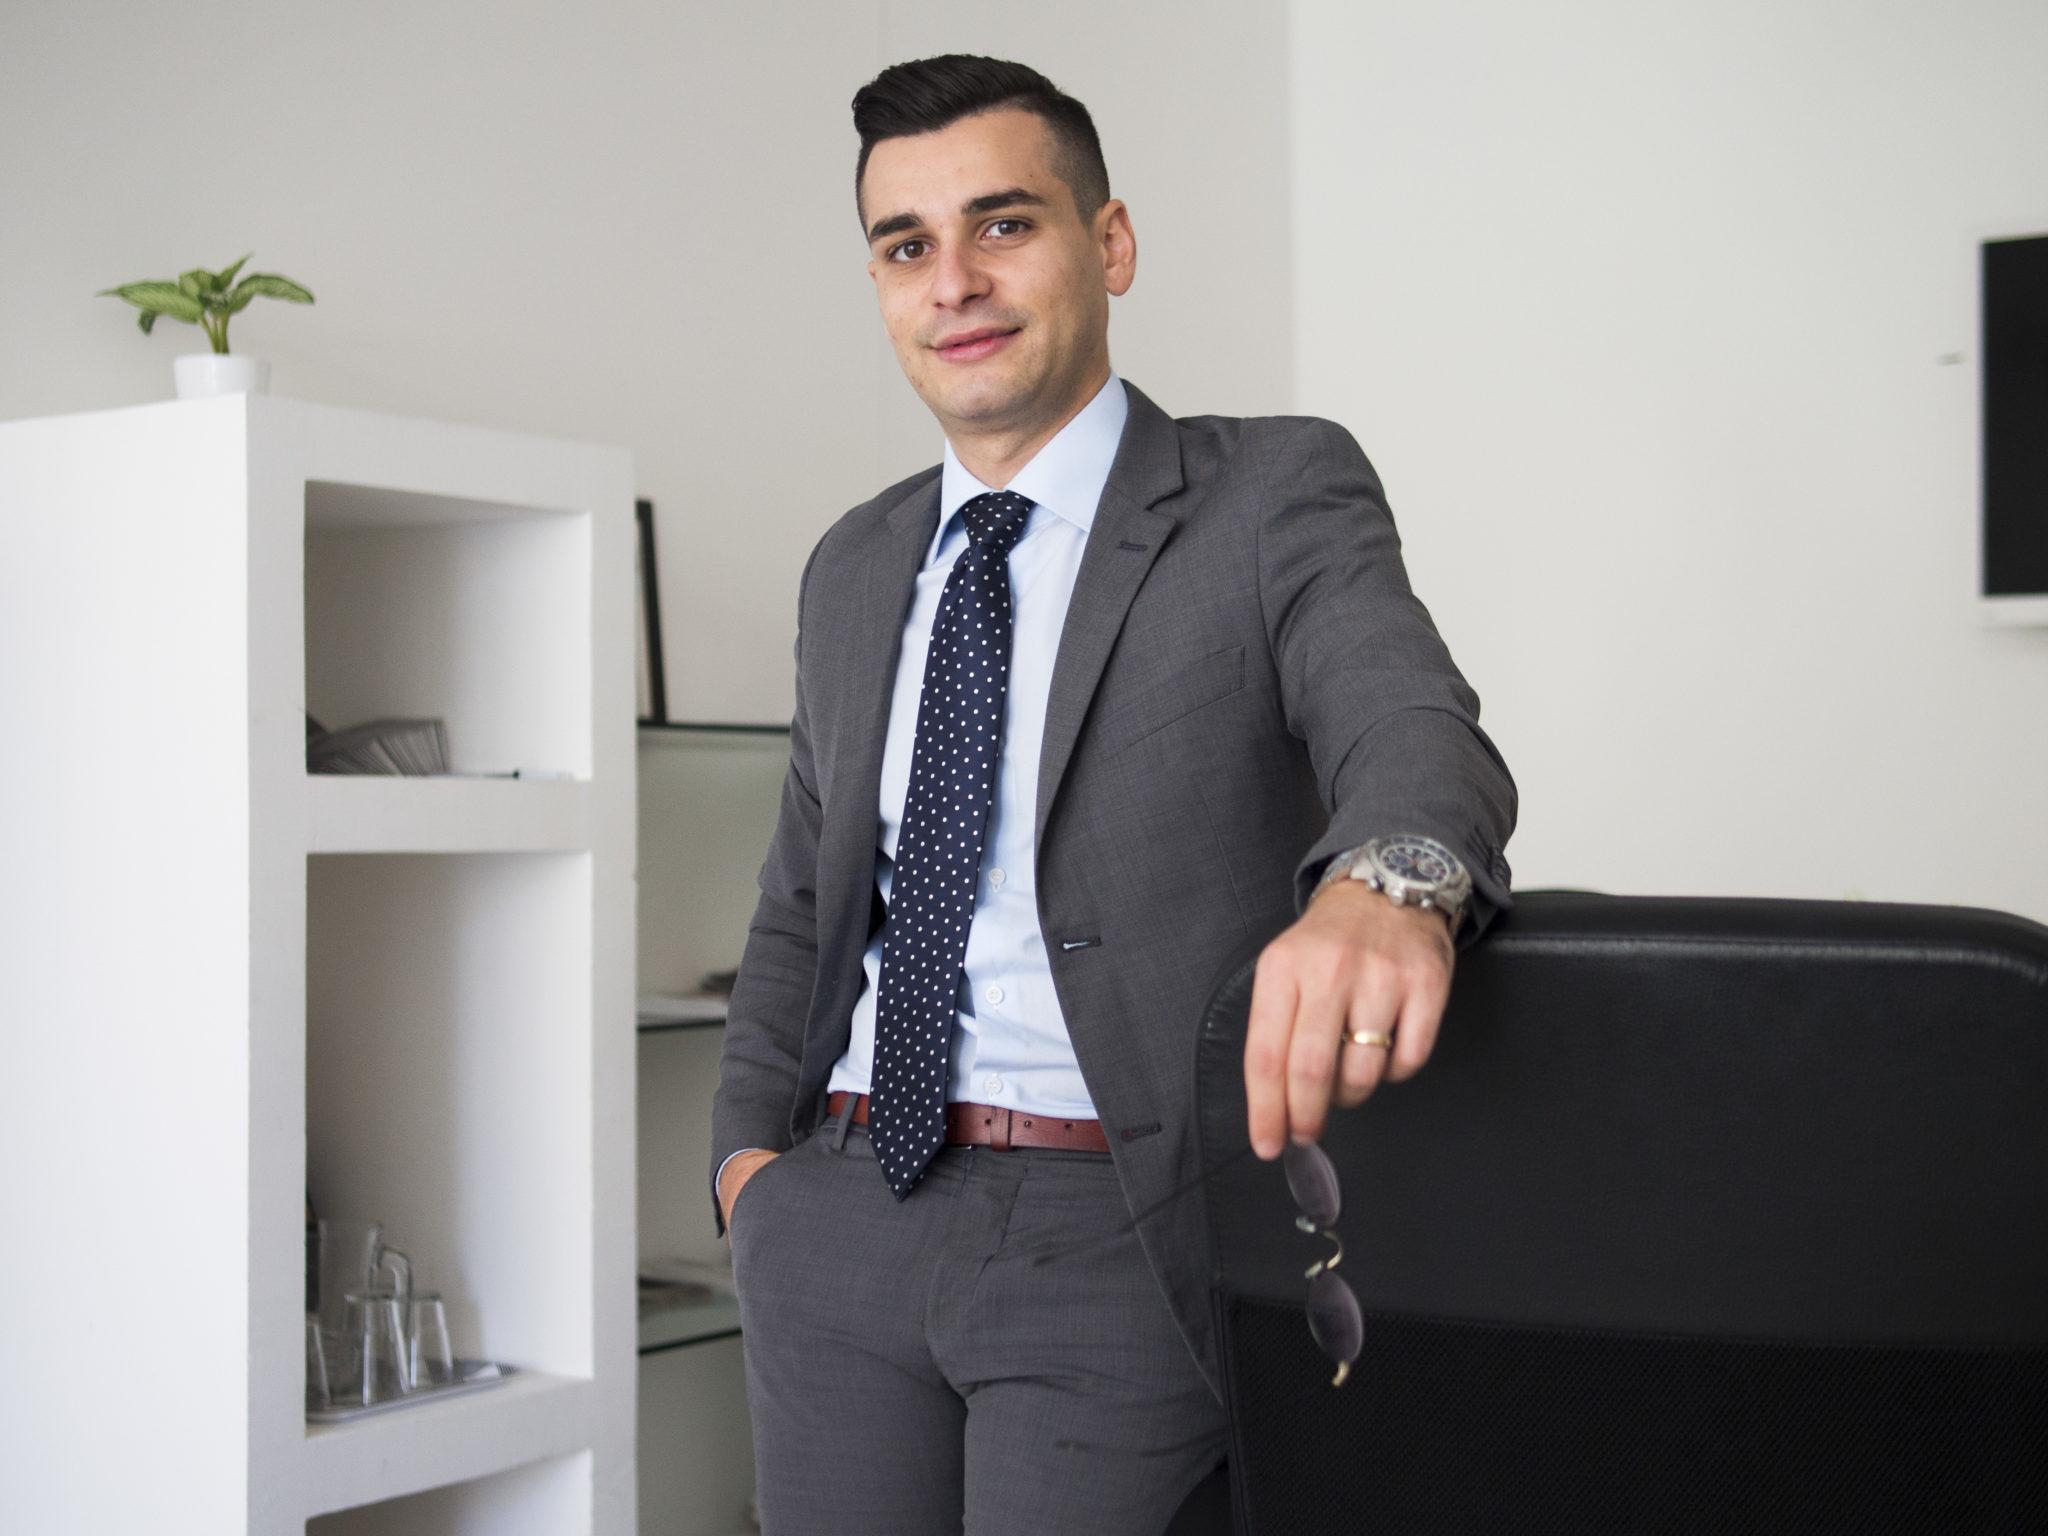 Biagio Dimartino